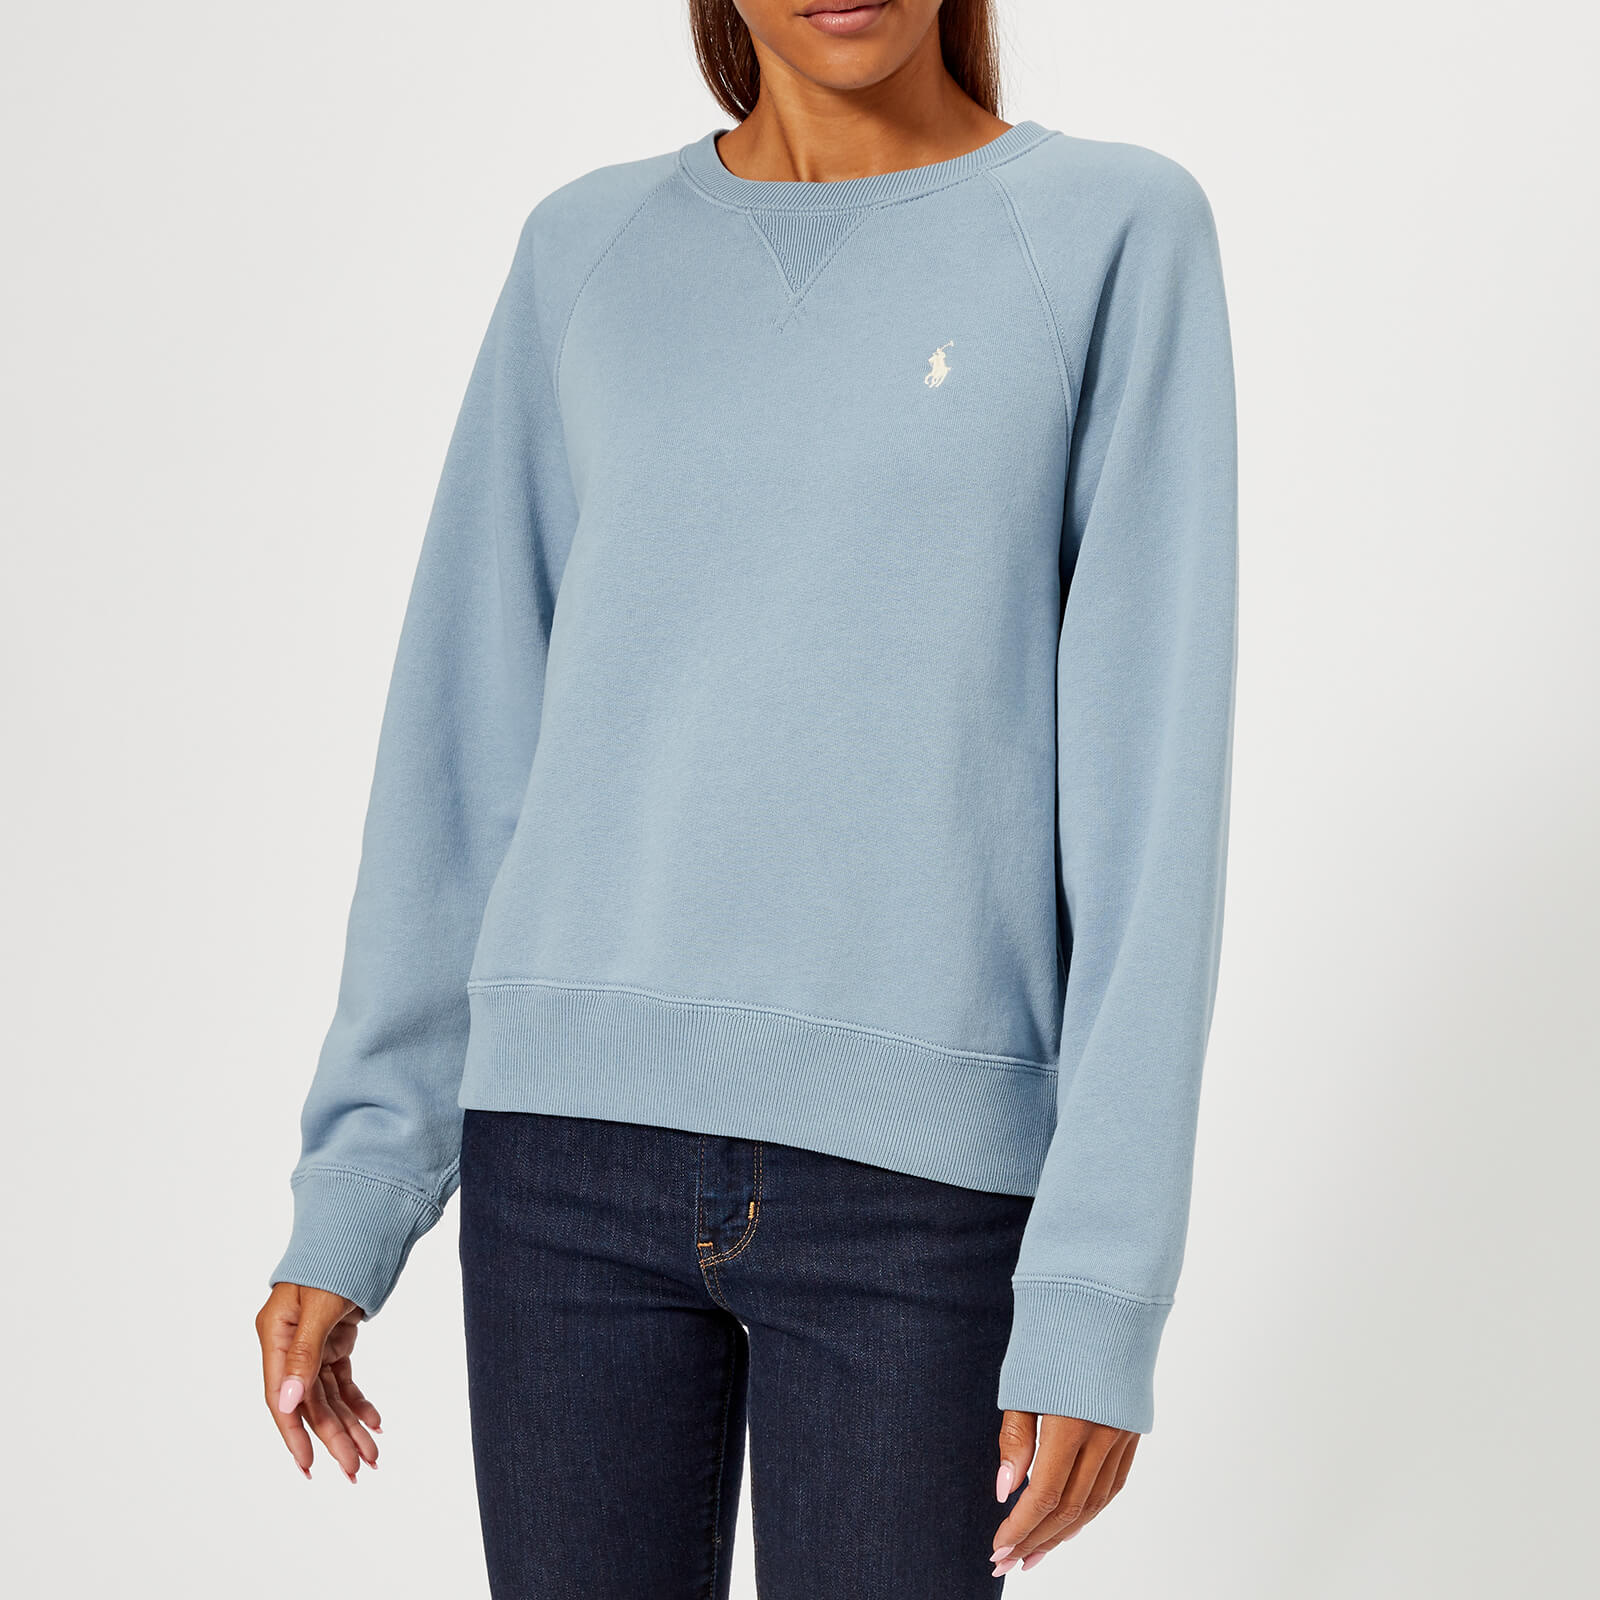 3057206f963 Polo Ralph Lauren Women s Logo Sweatshirt - Channel Blue - Free UK Delivery  over £50